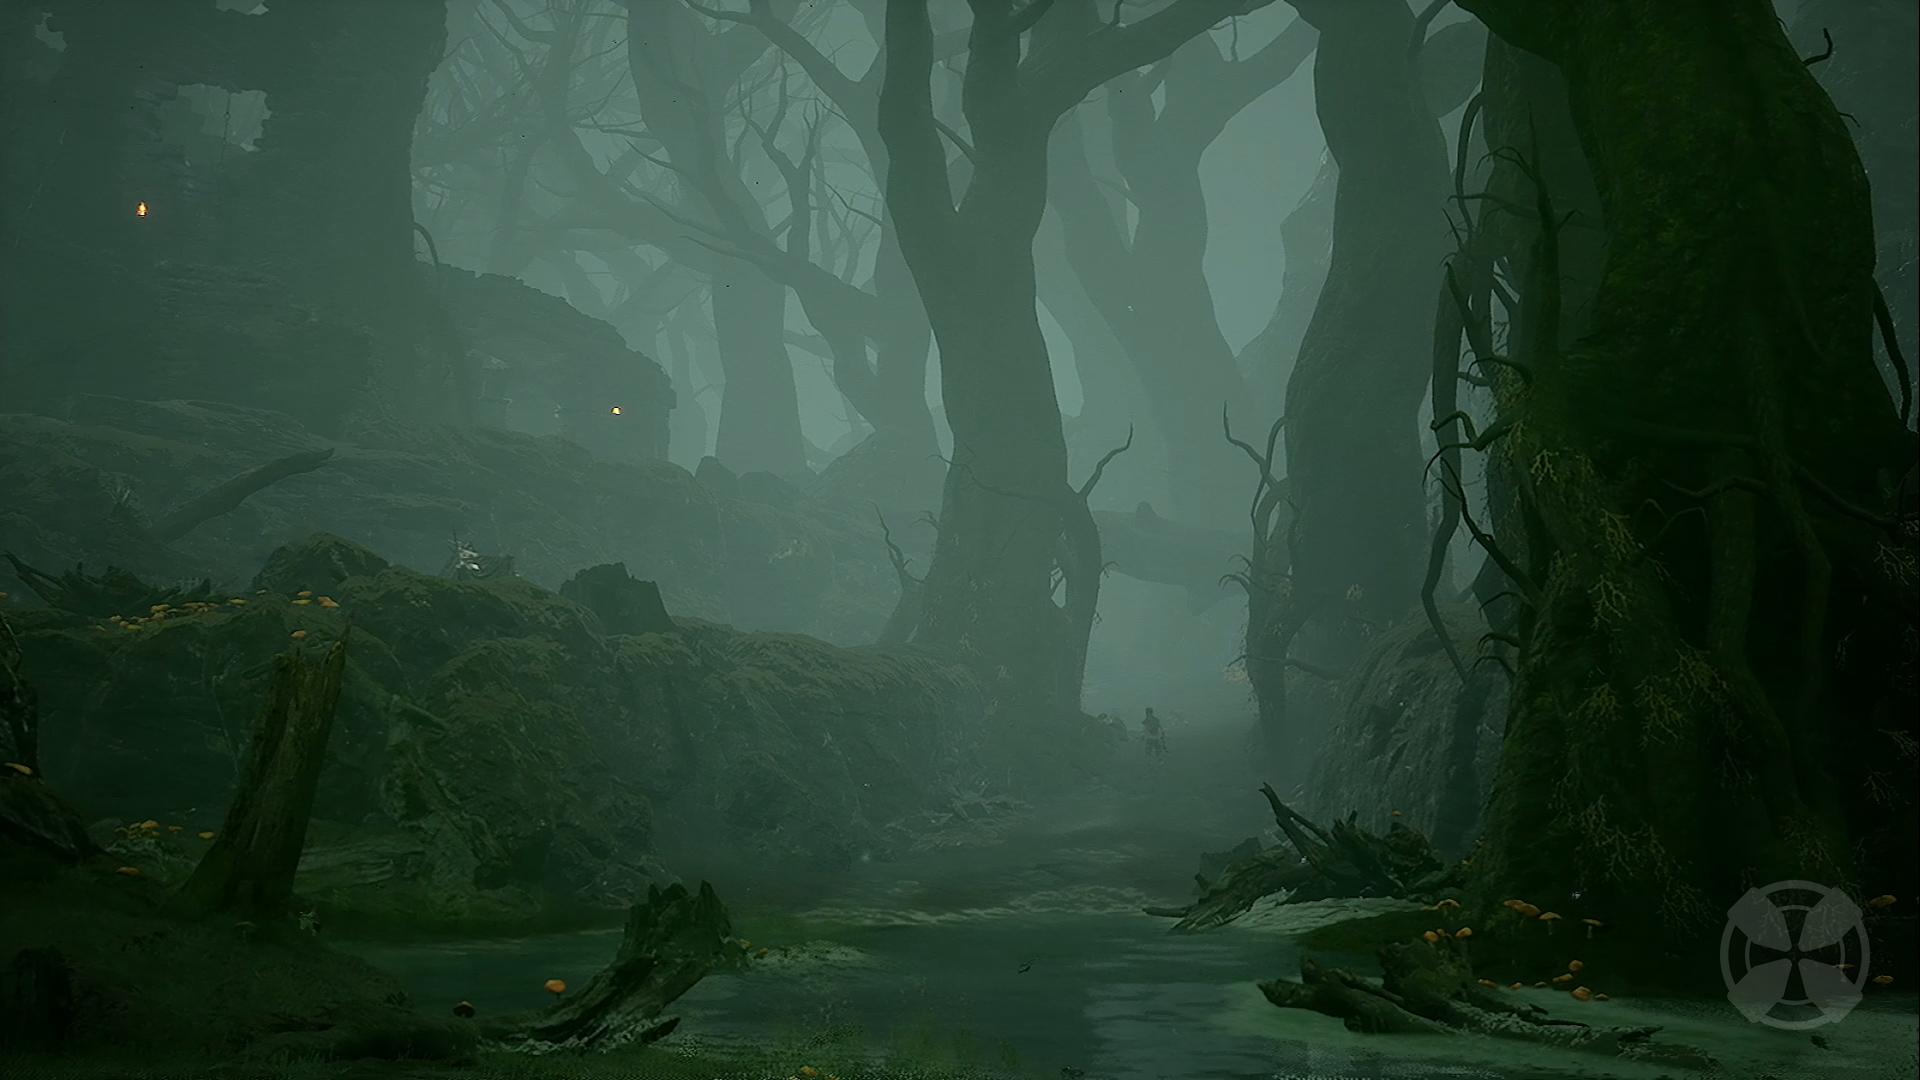 Screenshot showing the visuals of Mortal Shell.